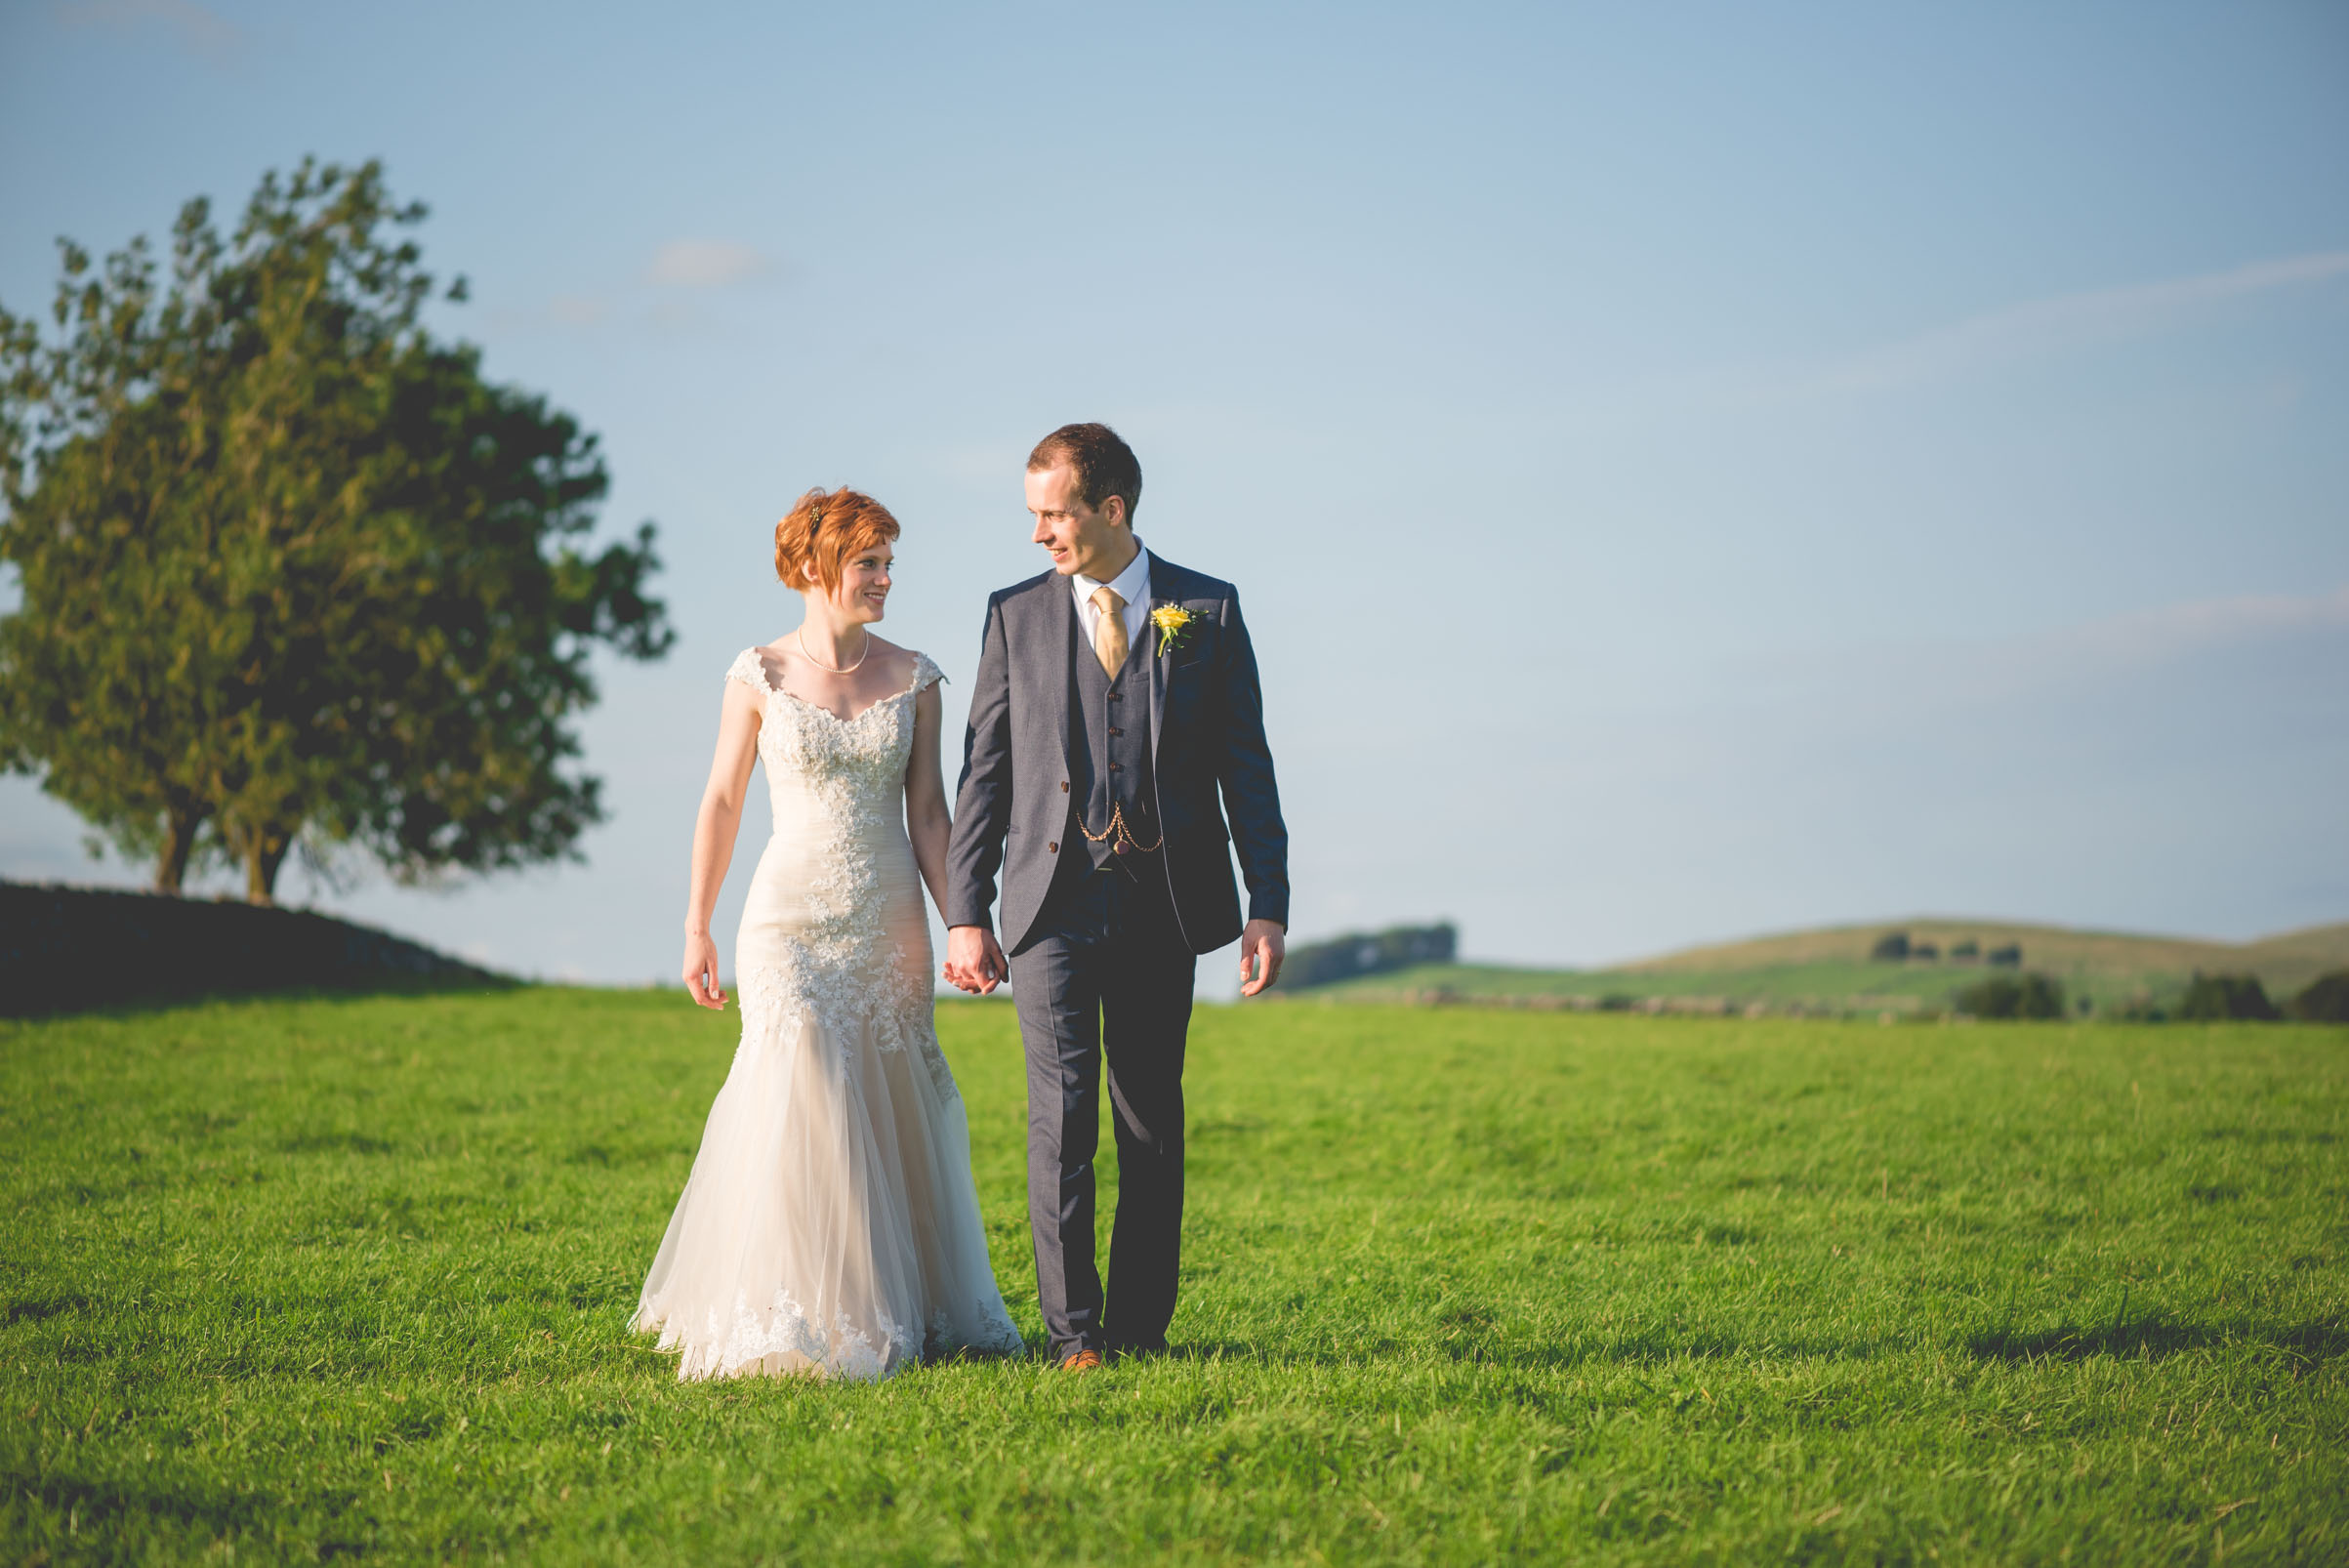 Peak+district+farm+wedding+lower+damgate+photographer-196.jpg